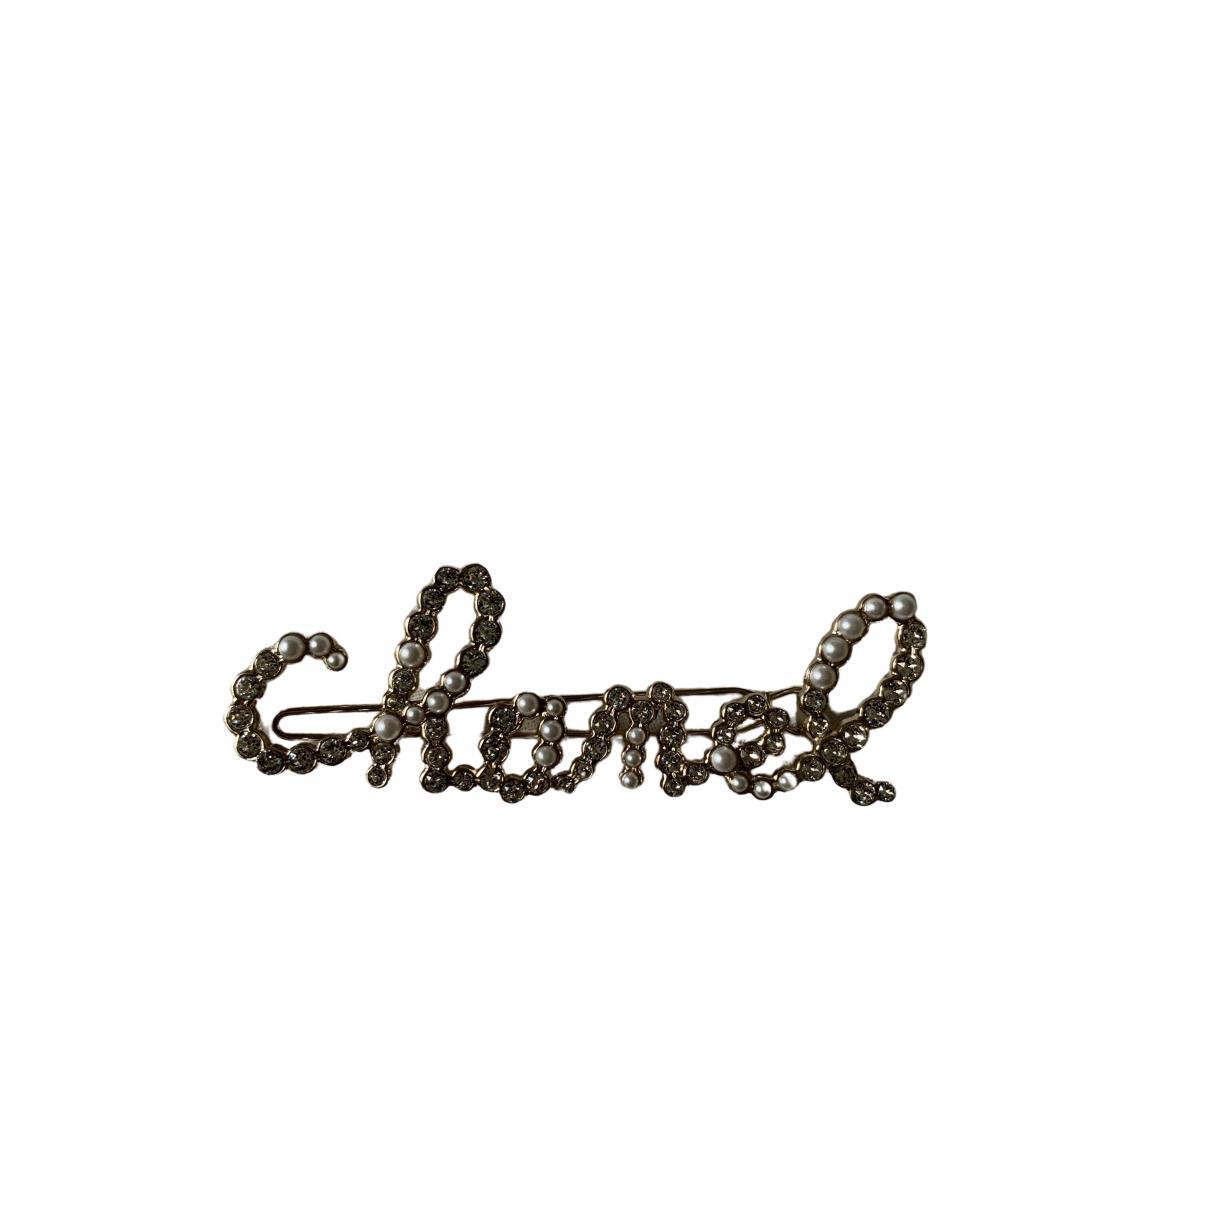 Broche en Metal Plateado Chanel